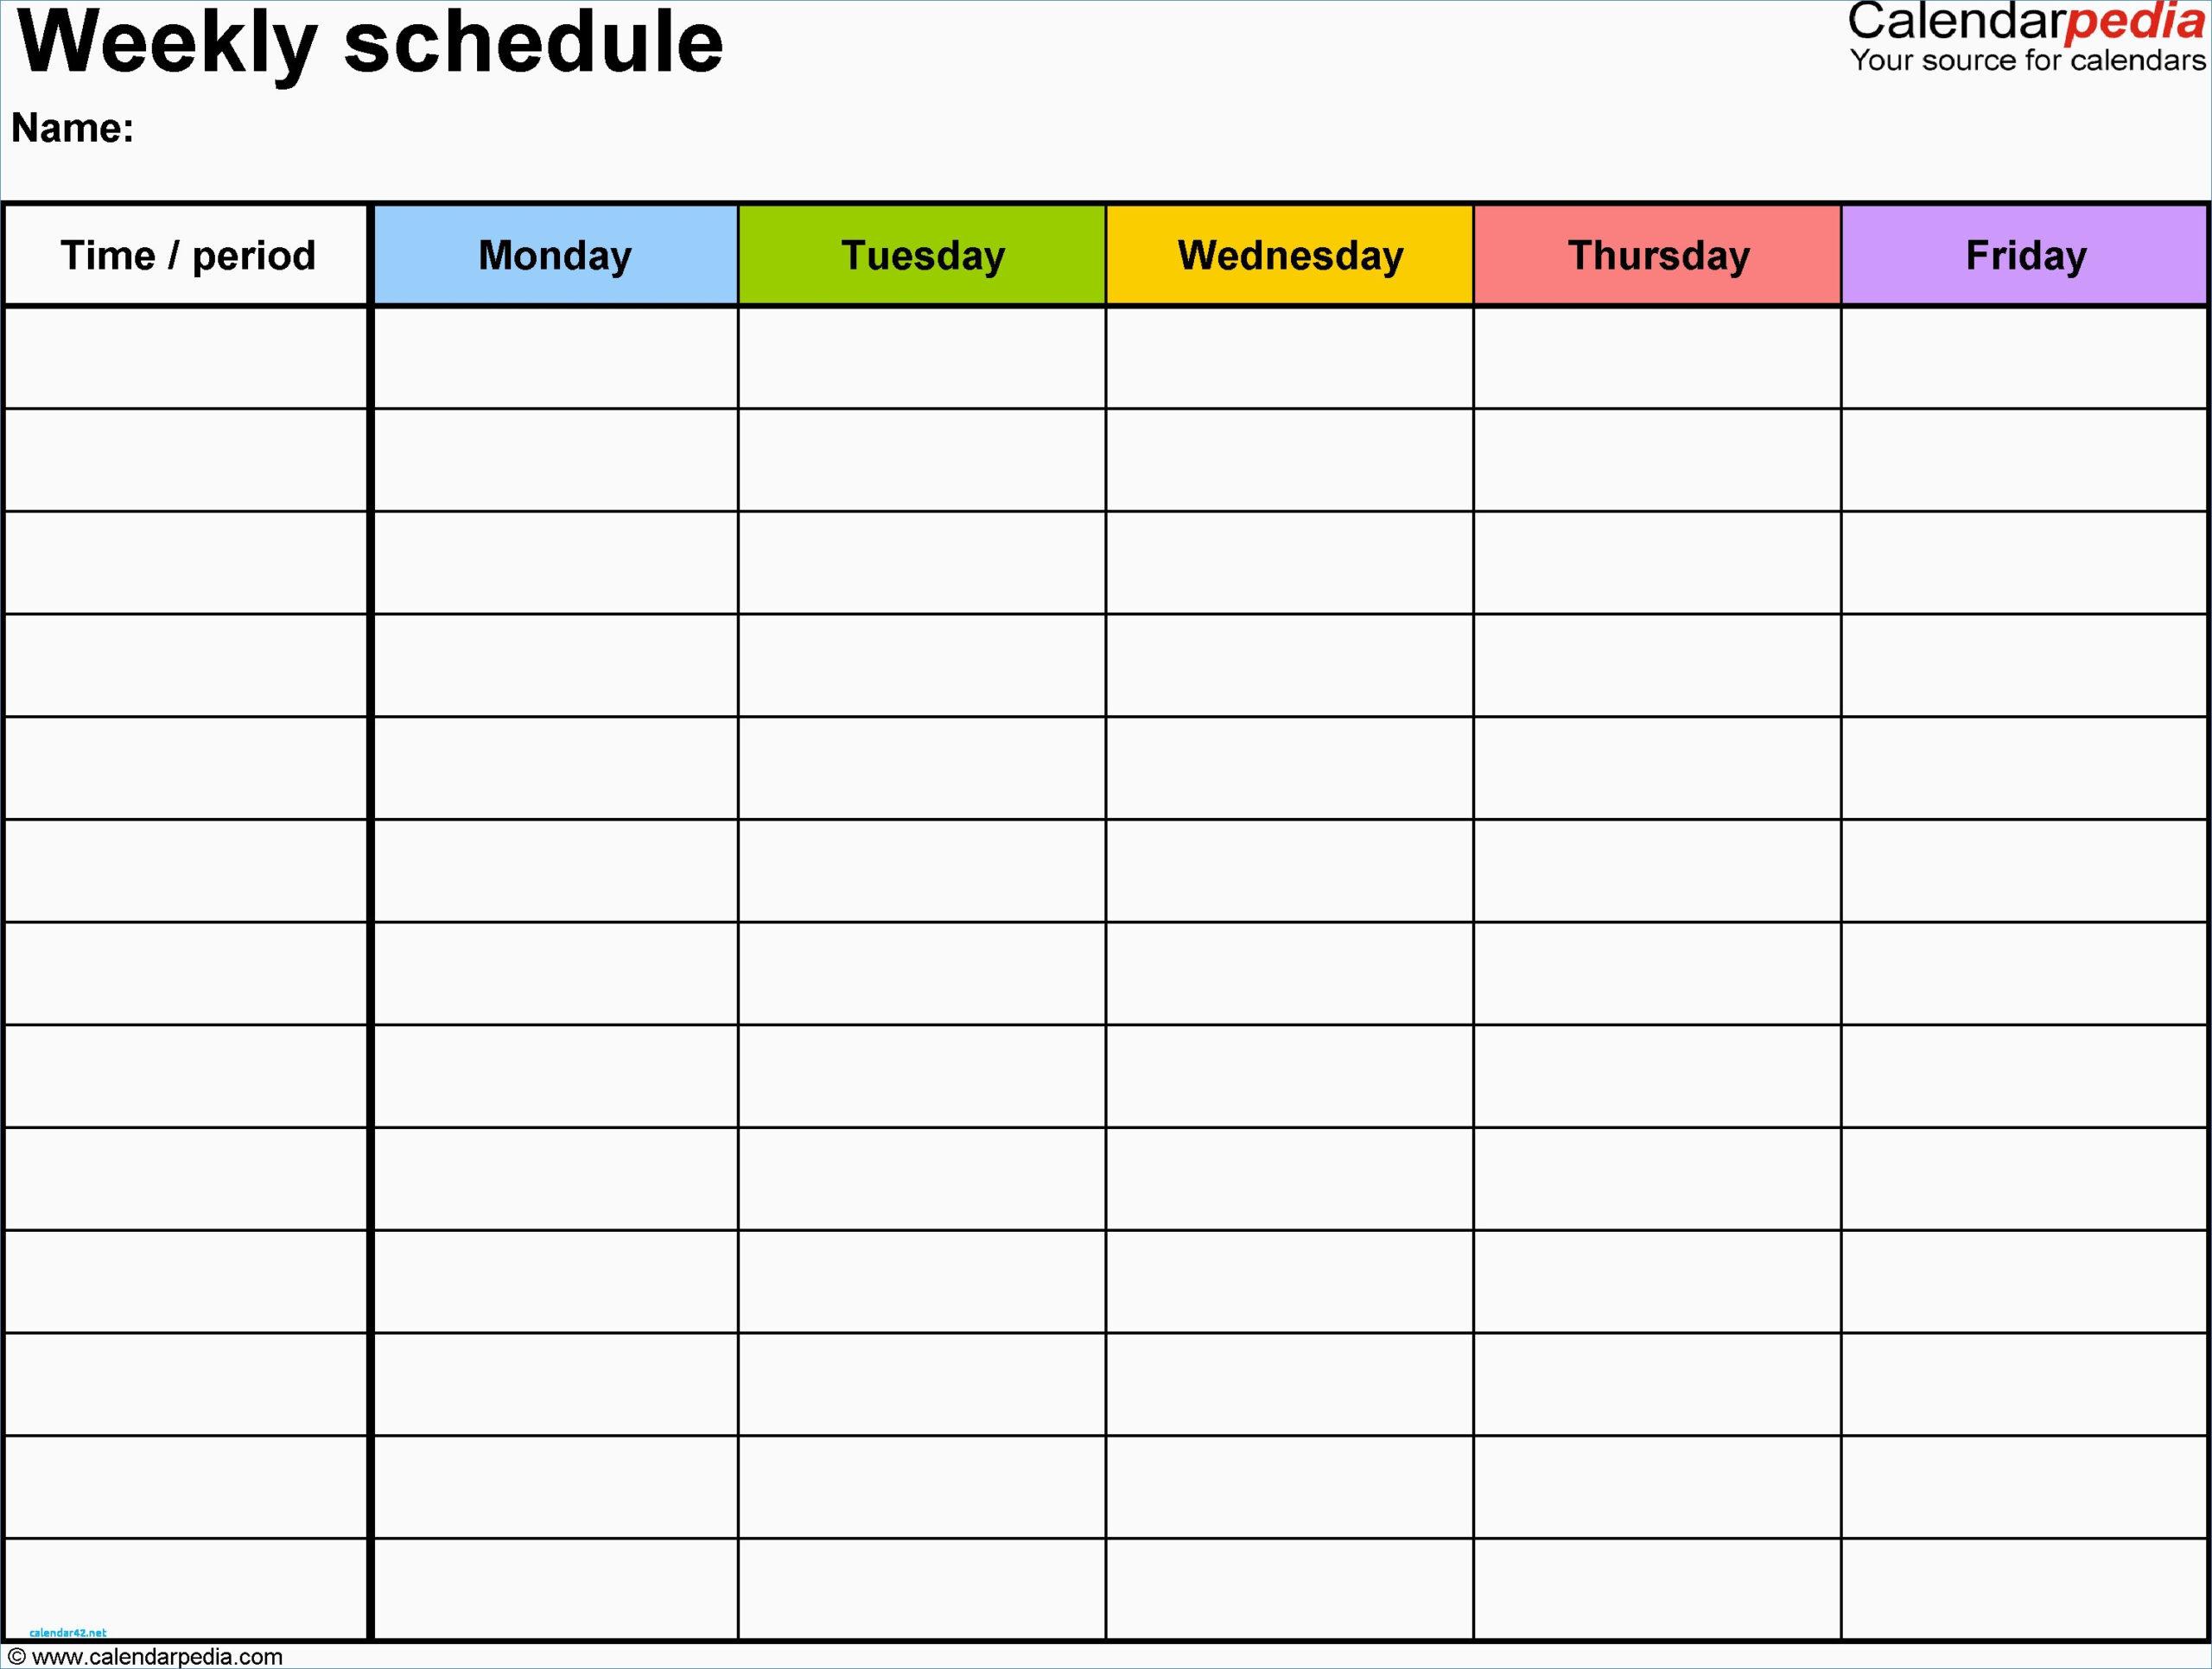 Fresh Printable Lined Calendar | Free Printable Calendar within Blank Monthly Calendar With Lines